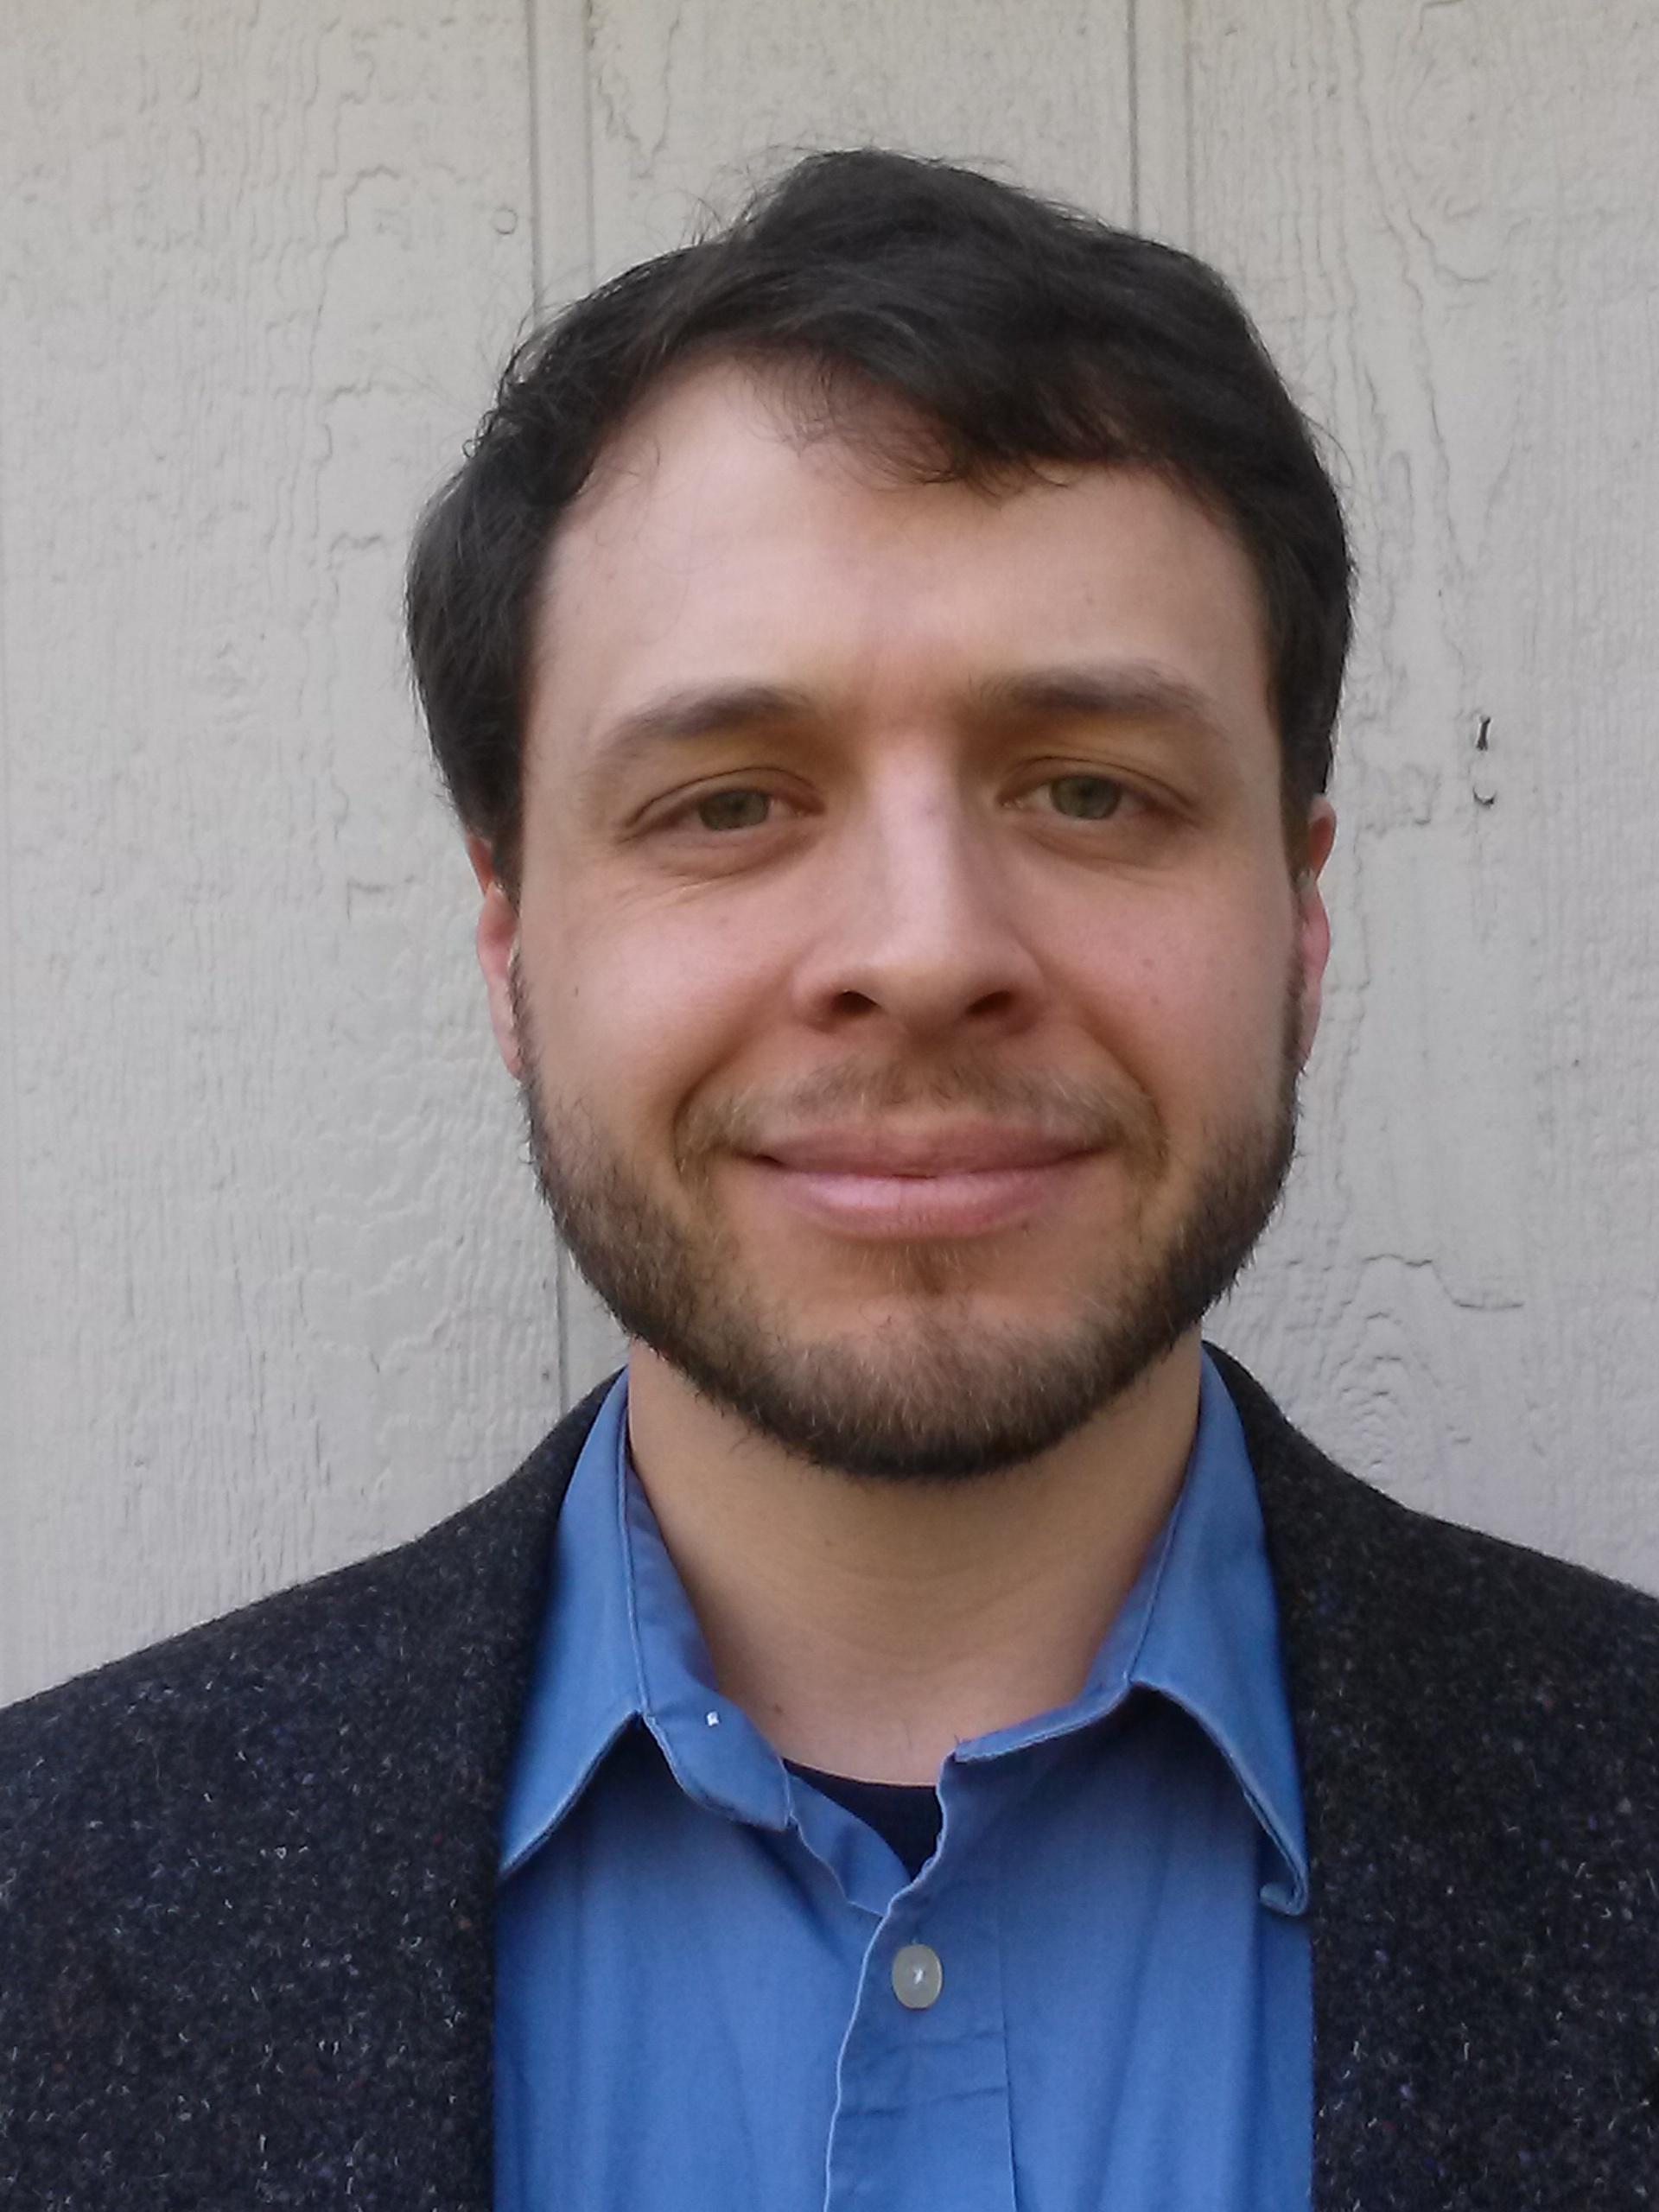 Joseph Tennant ID Picture